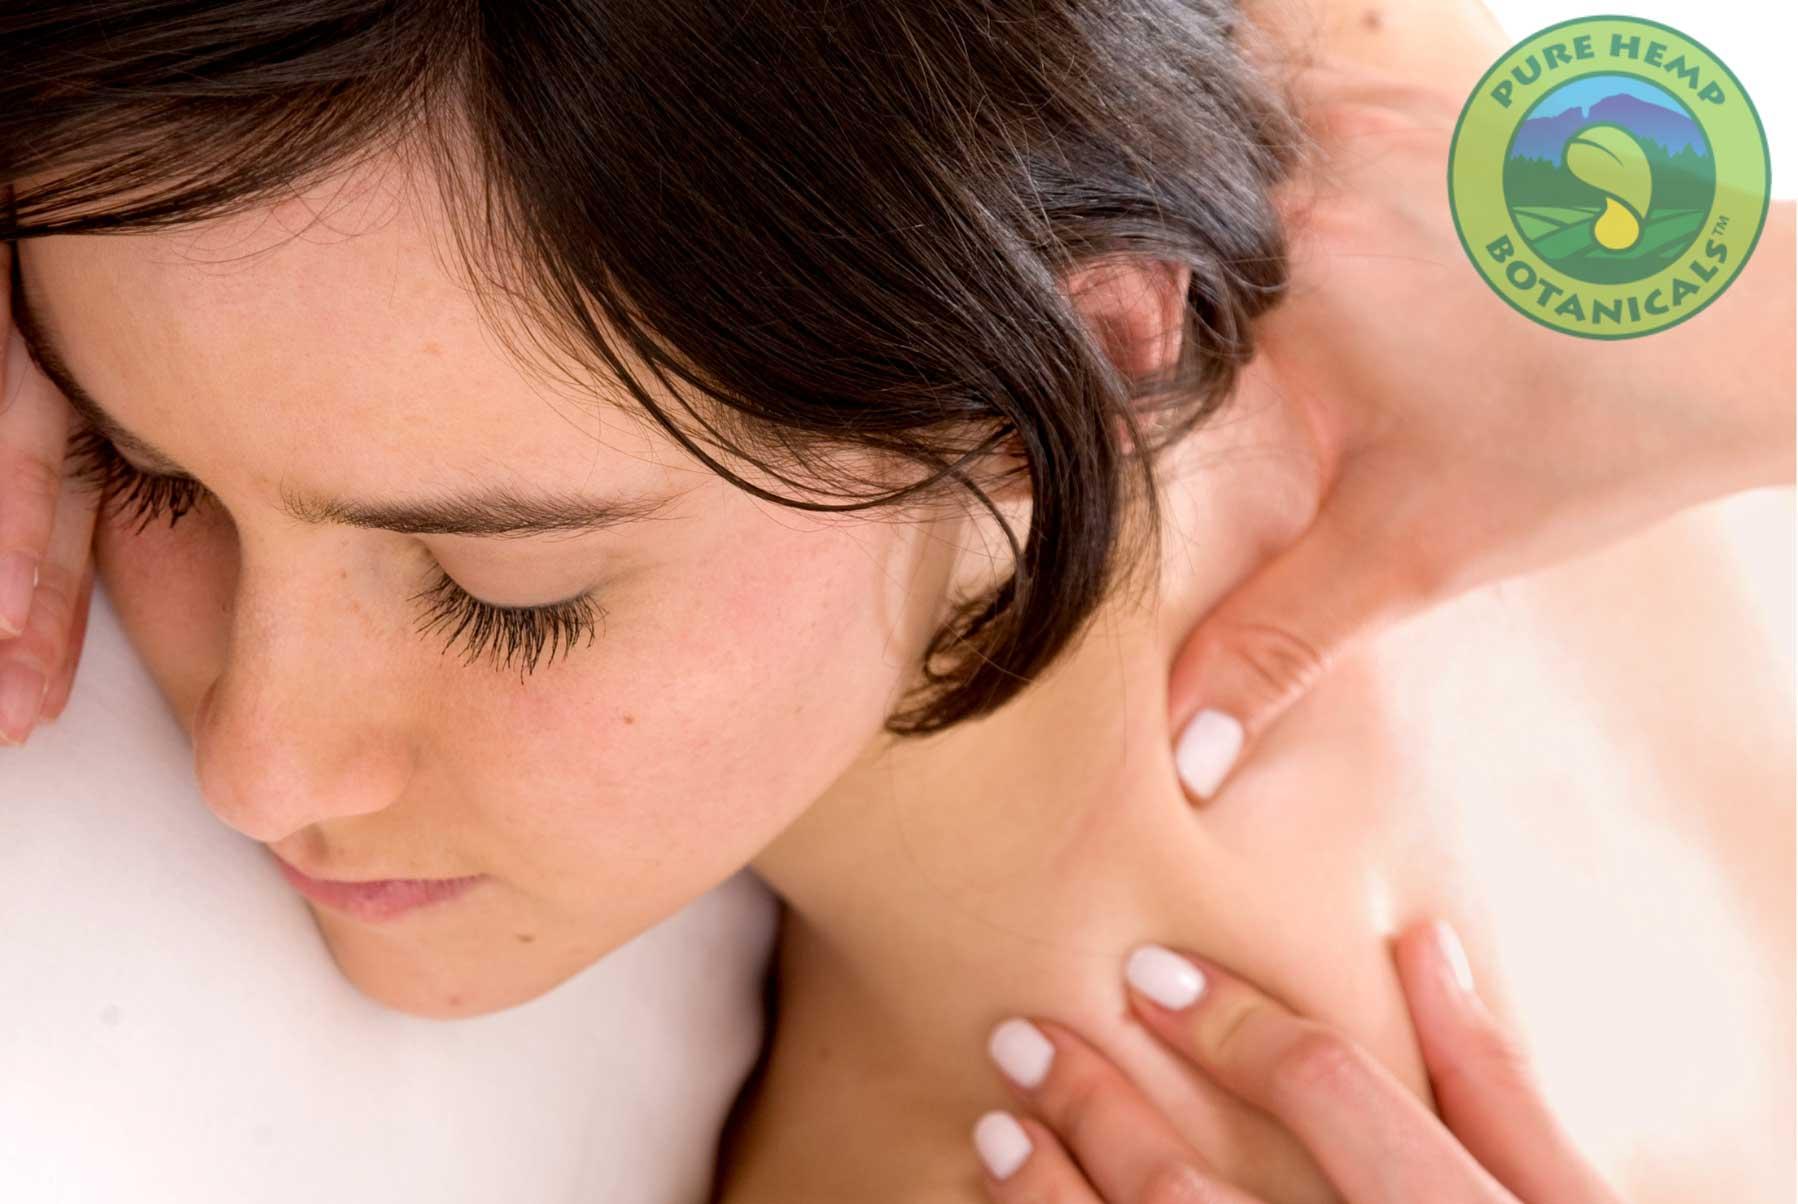 Using Your Pure Hemp Botanicals CBD Tincture During a Massage